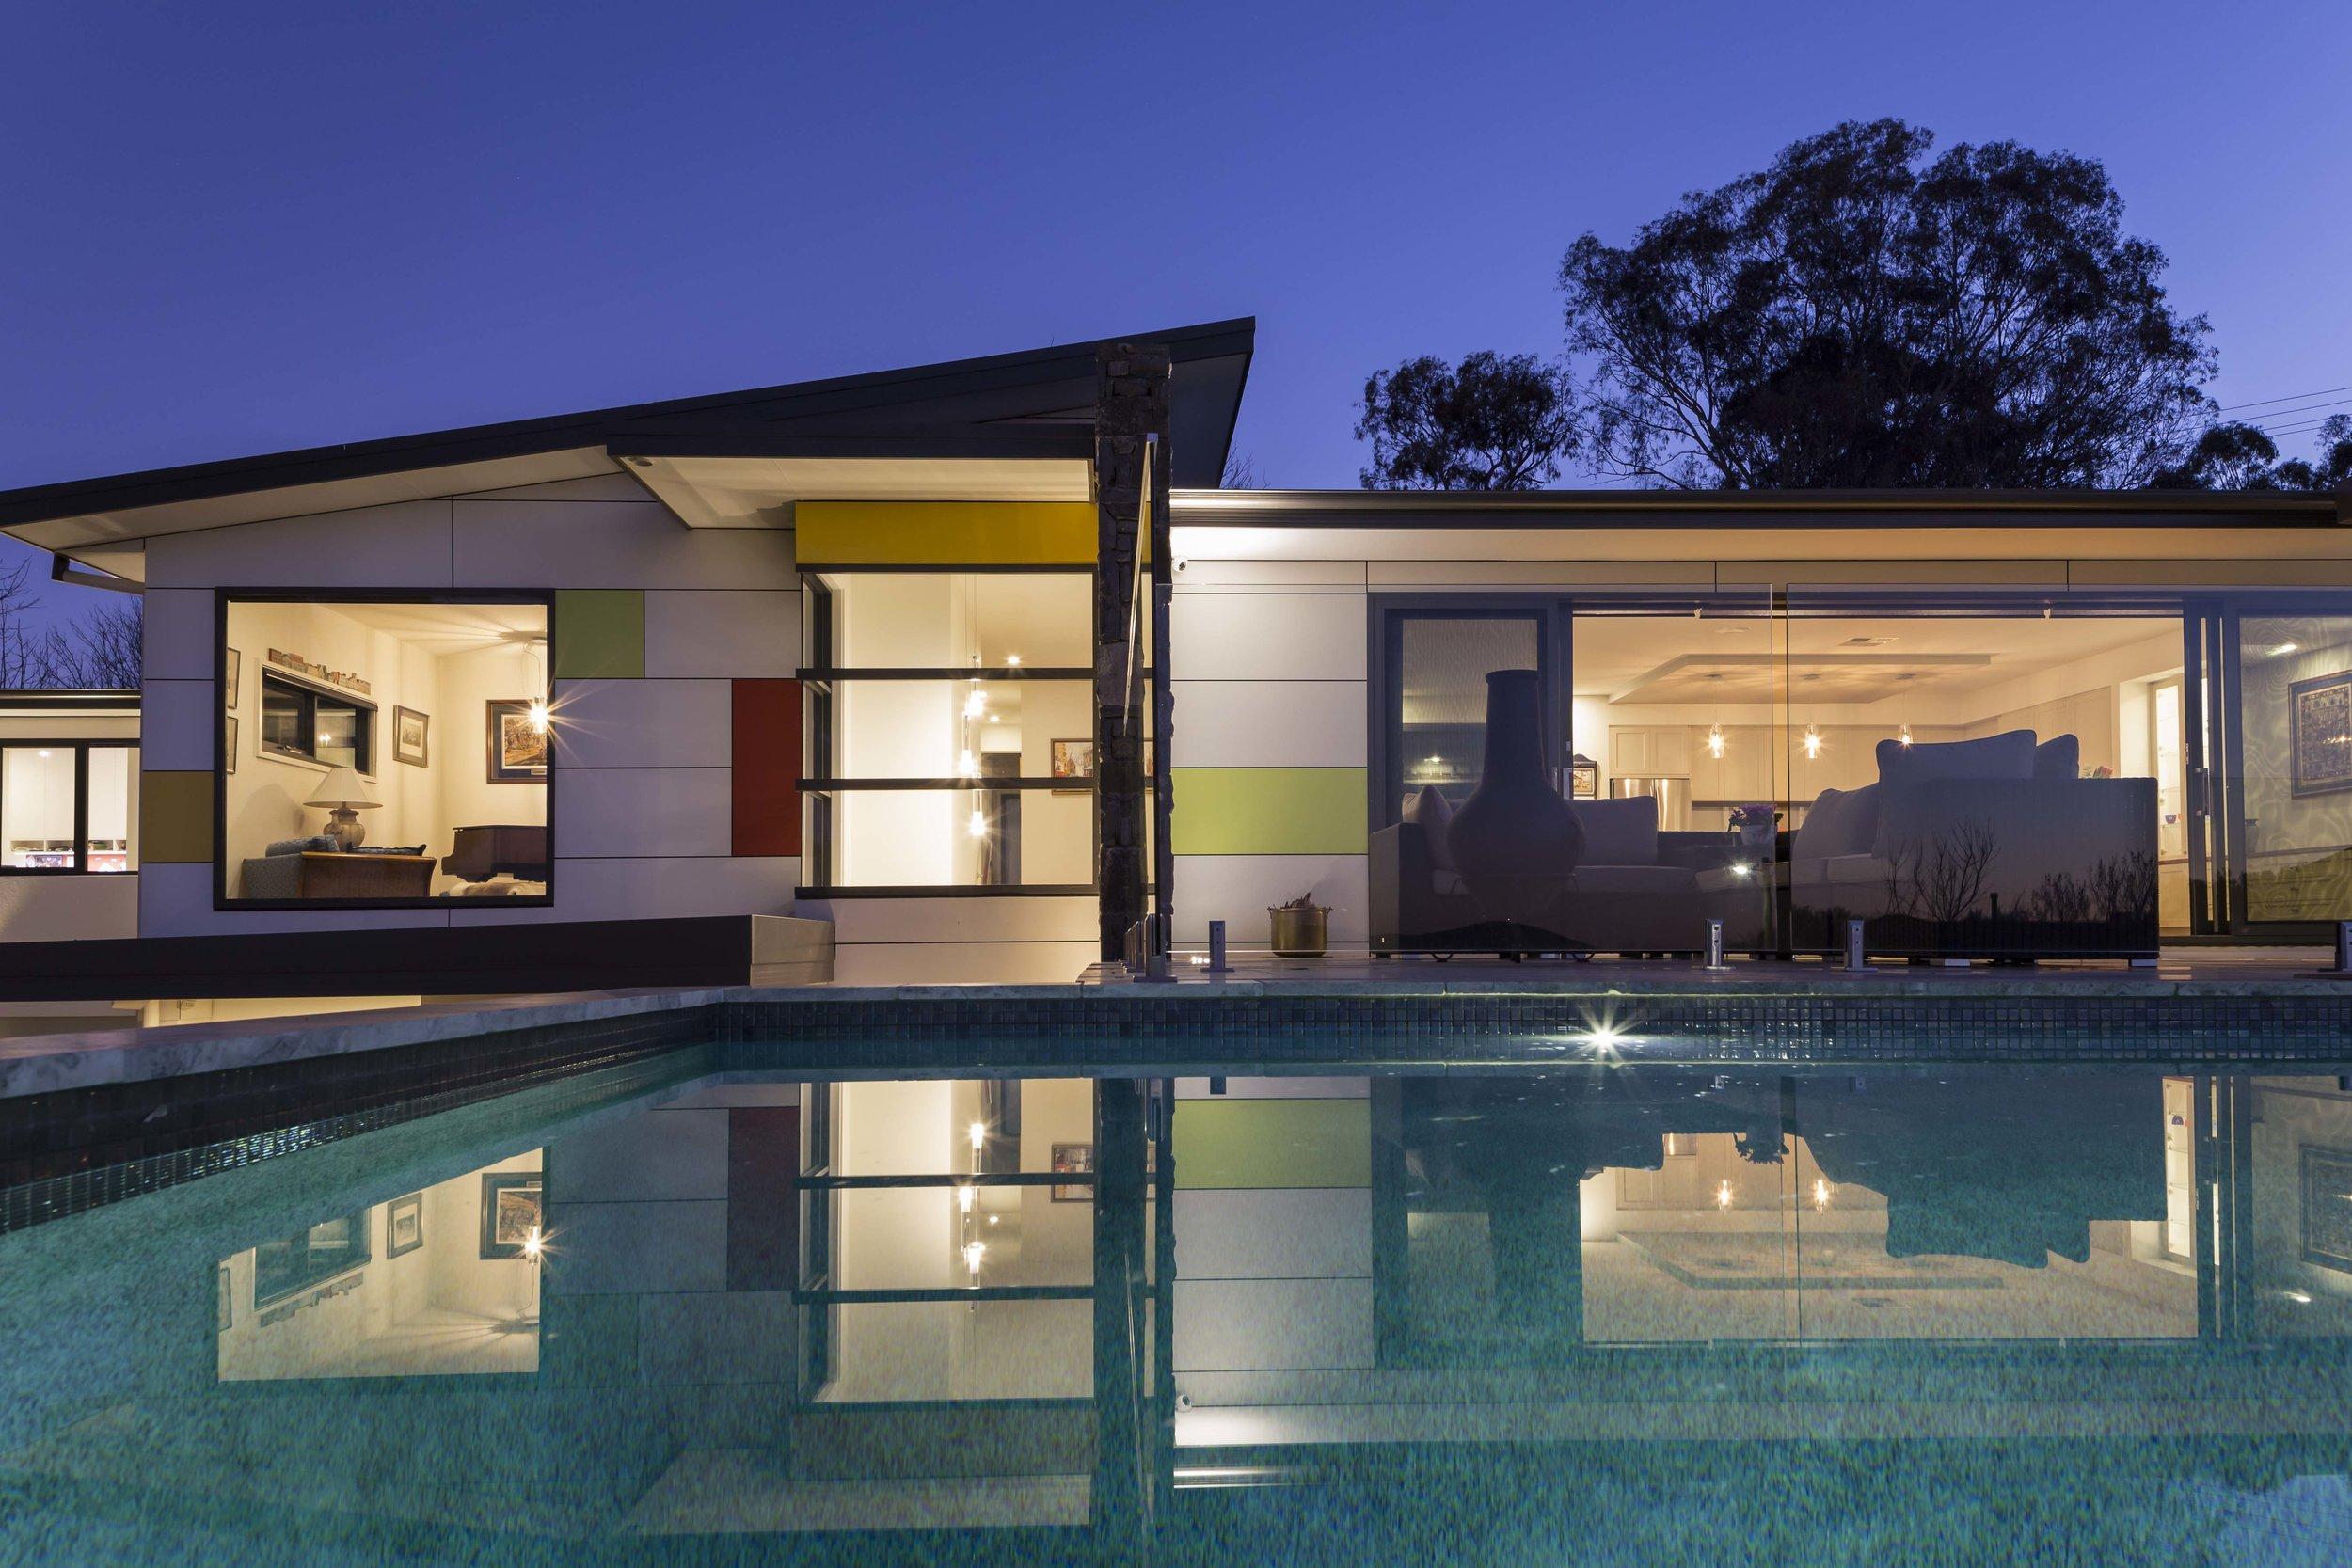 marina-mcdonald-architectural-photographer-canberra-adam-hobill-design-exterior-pool